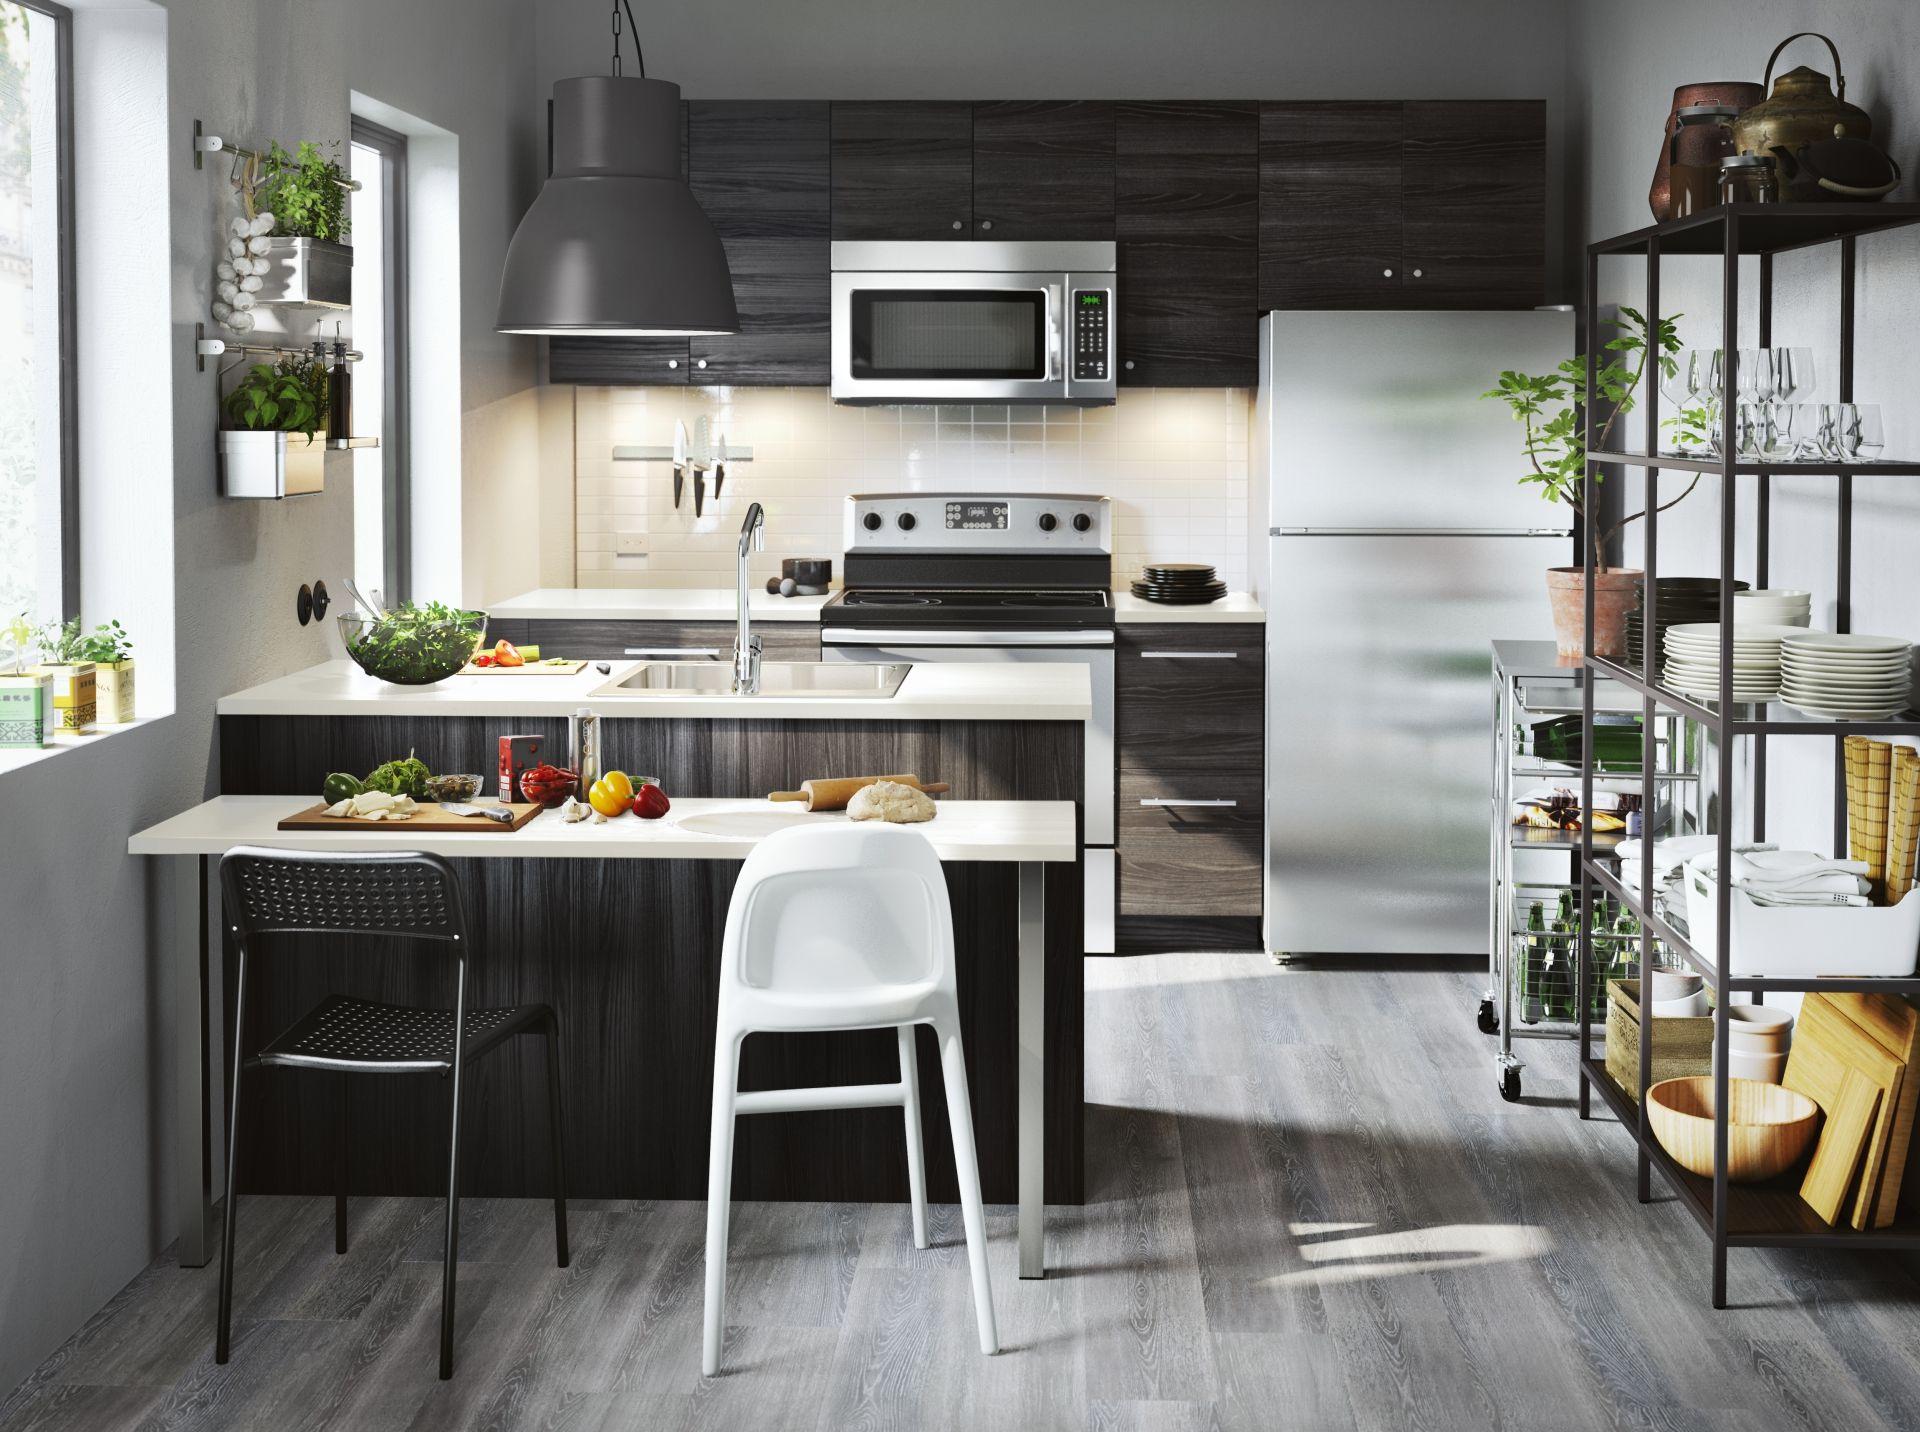 Keuken Zwart Ikea : Metod tingsryd keuken ikea ikeanl ikeanederland interieur